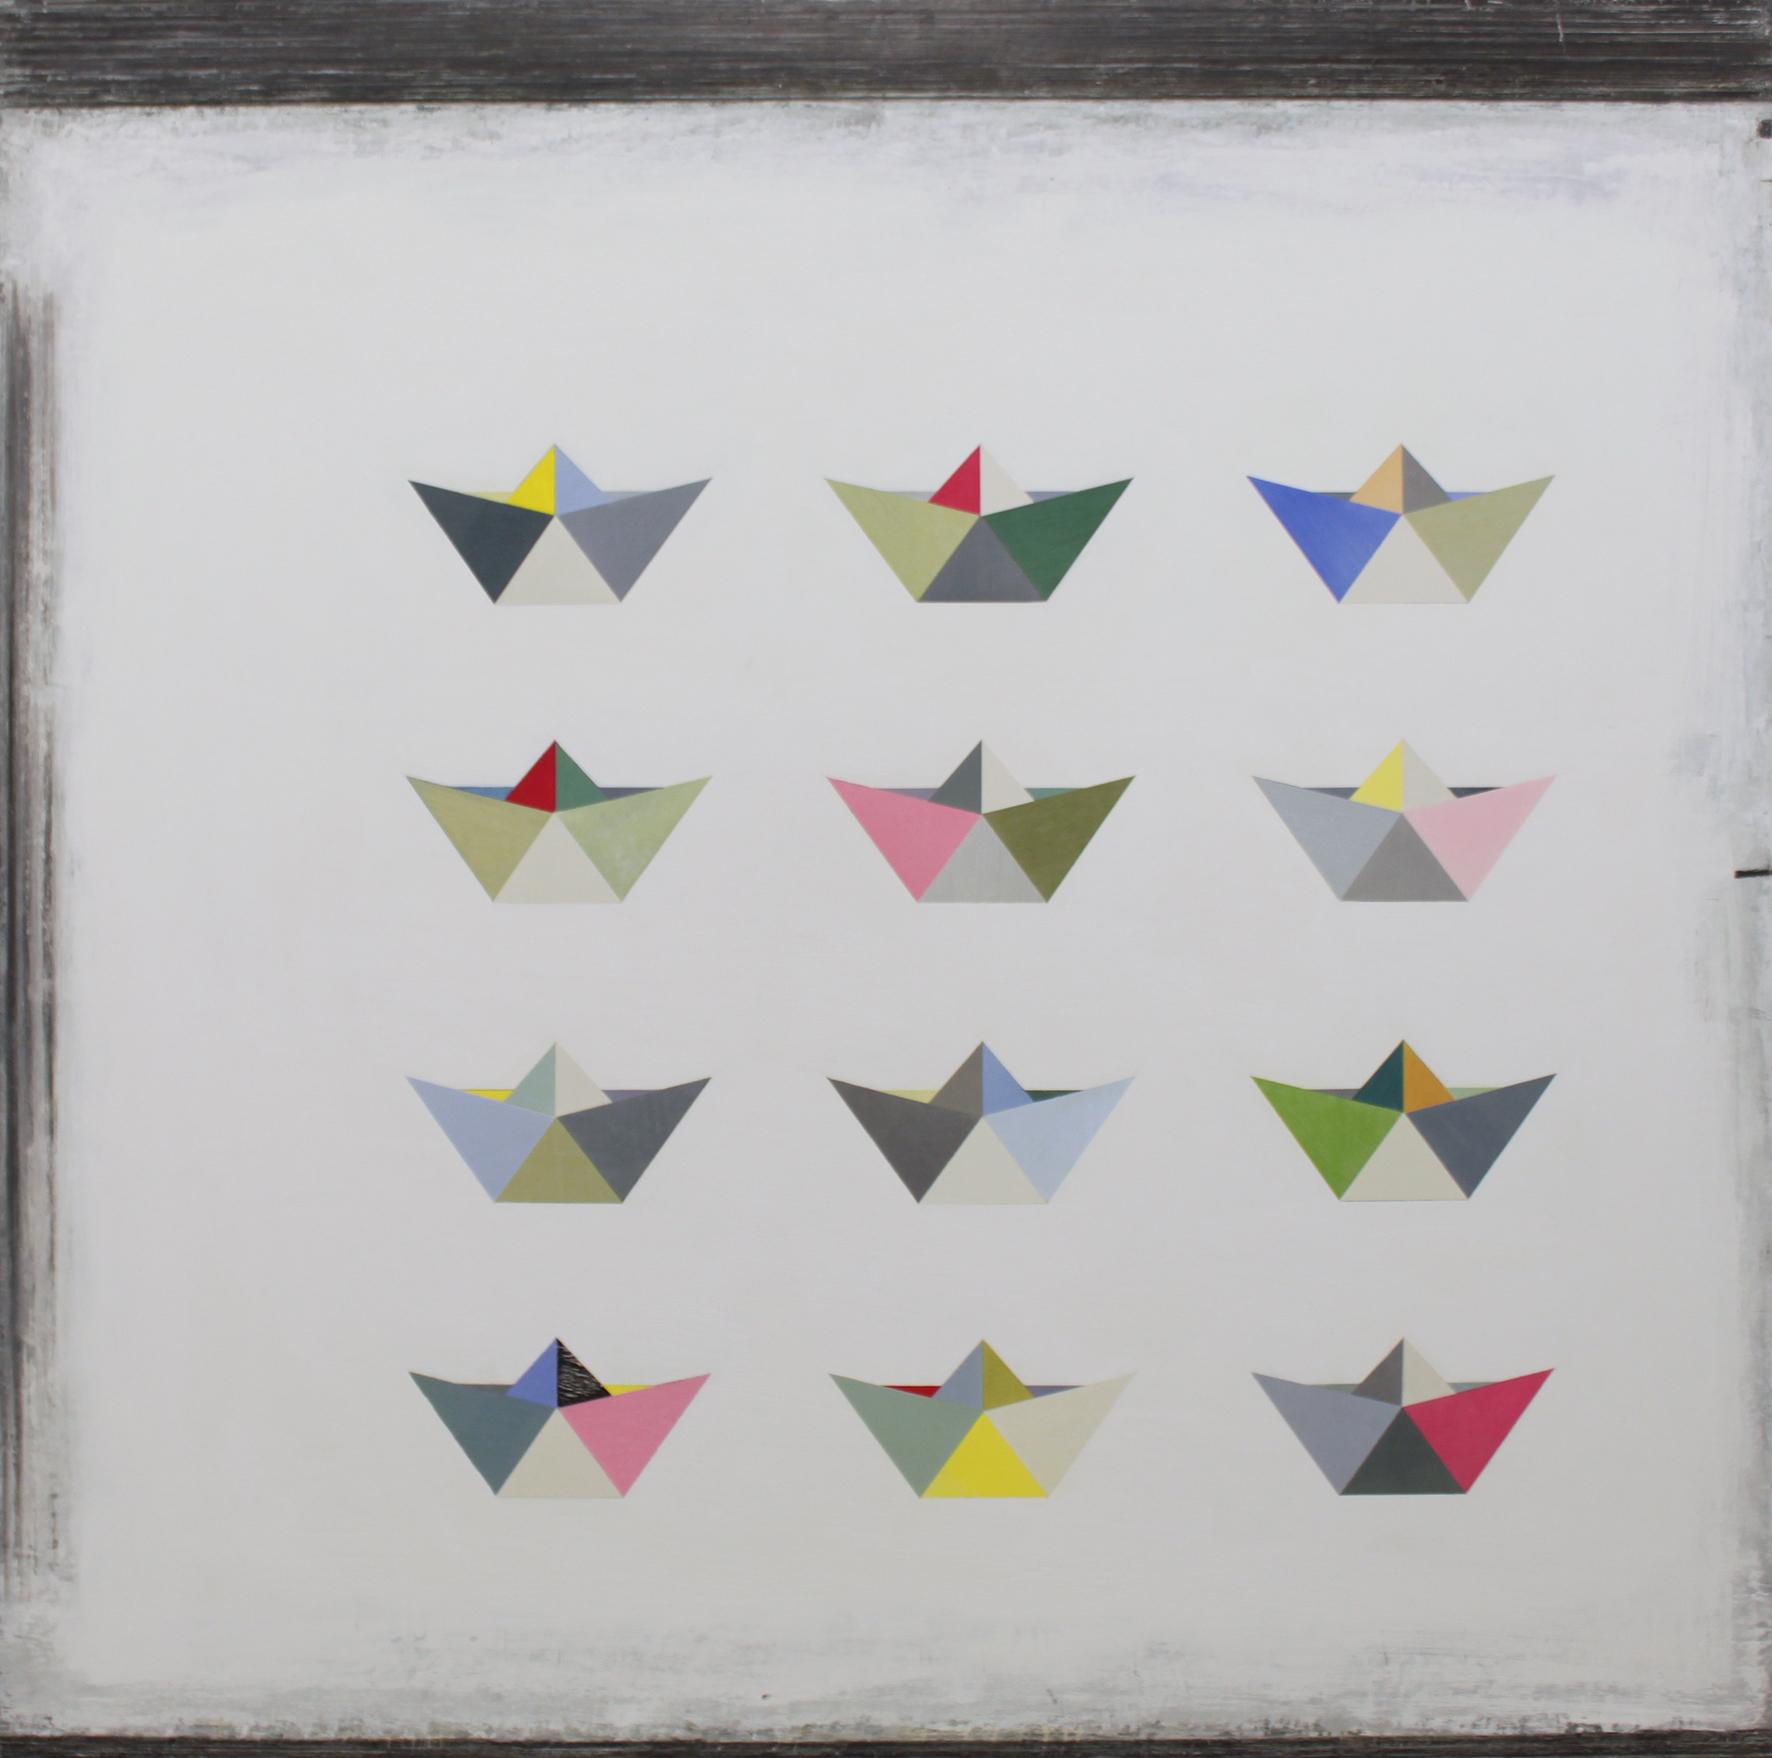 Paul Fry 12 Origami Boats 100 x 100 cm oil, gouache & graphite on canvas £3000